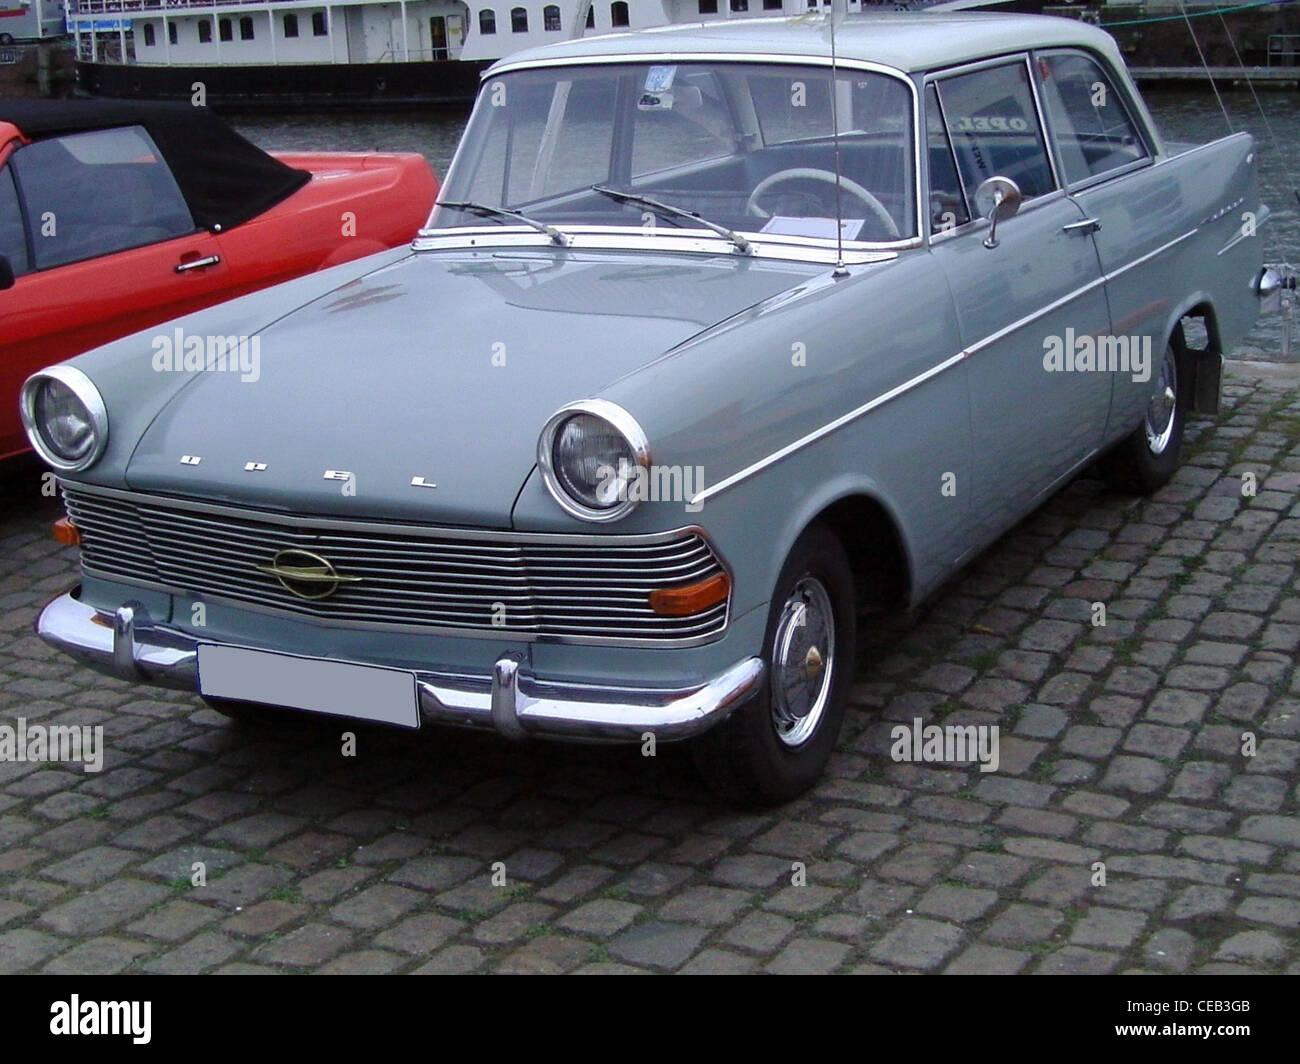 Opel Rekord P2 Stock Photo Alamy